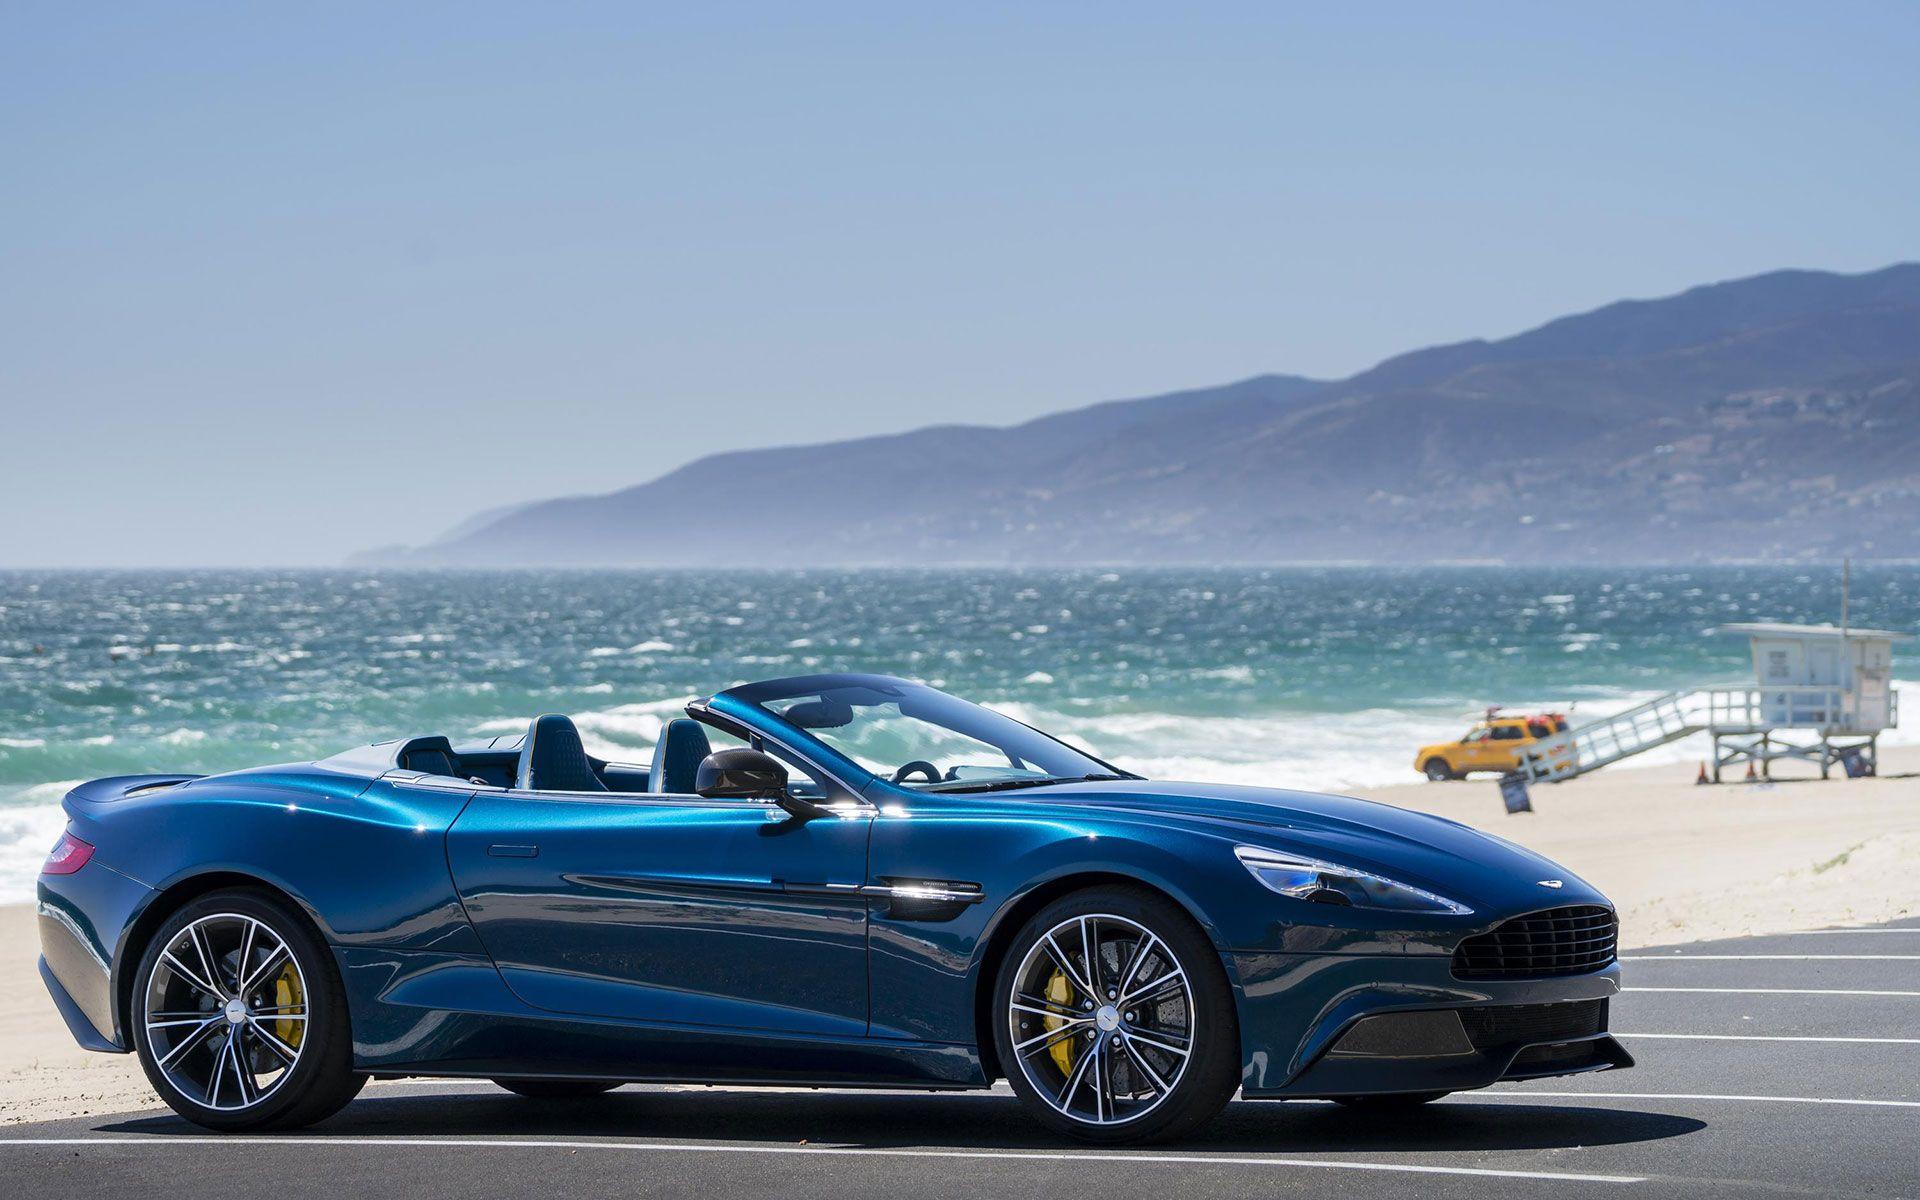 2015 Aston Martin Vanquish HD Car Wallpaper 2015AstonMartinVanquish